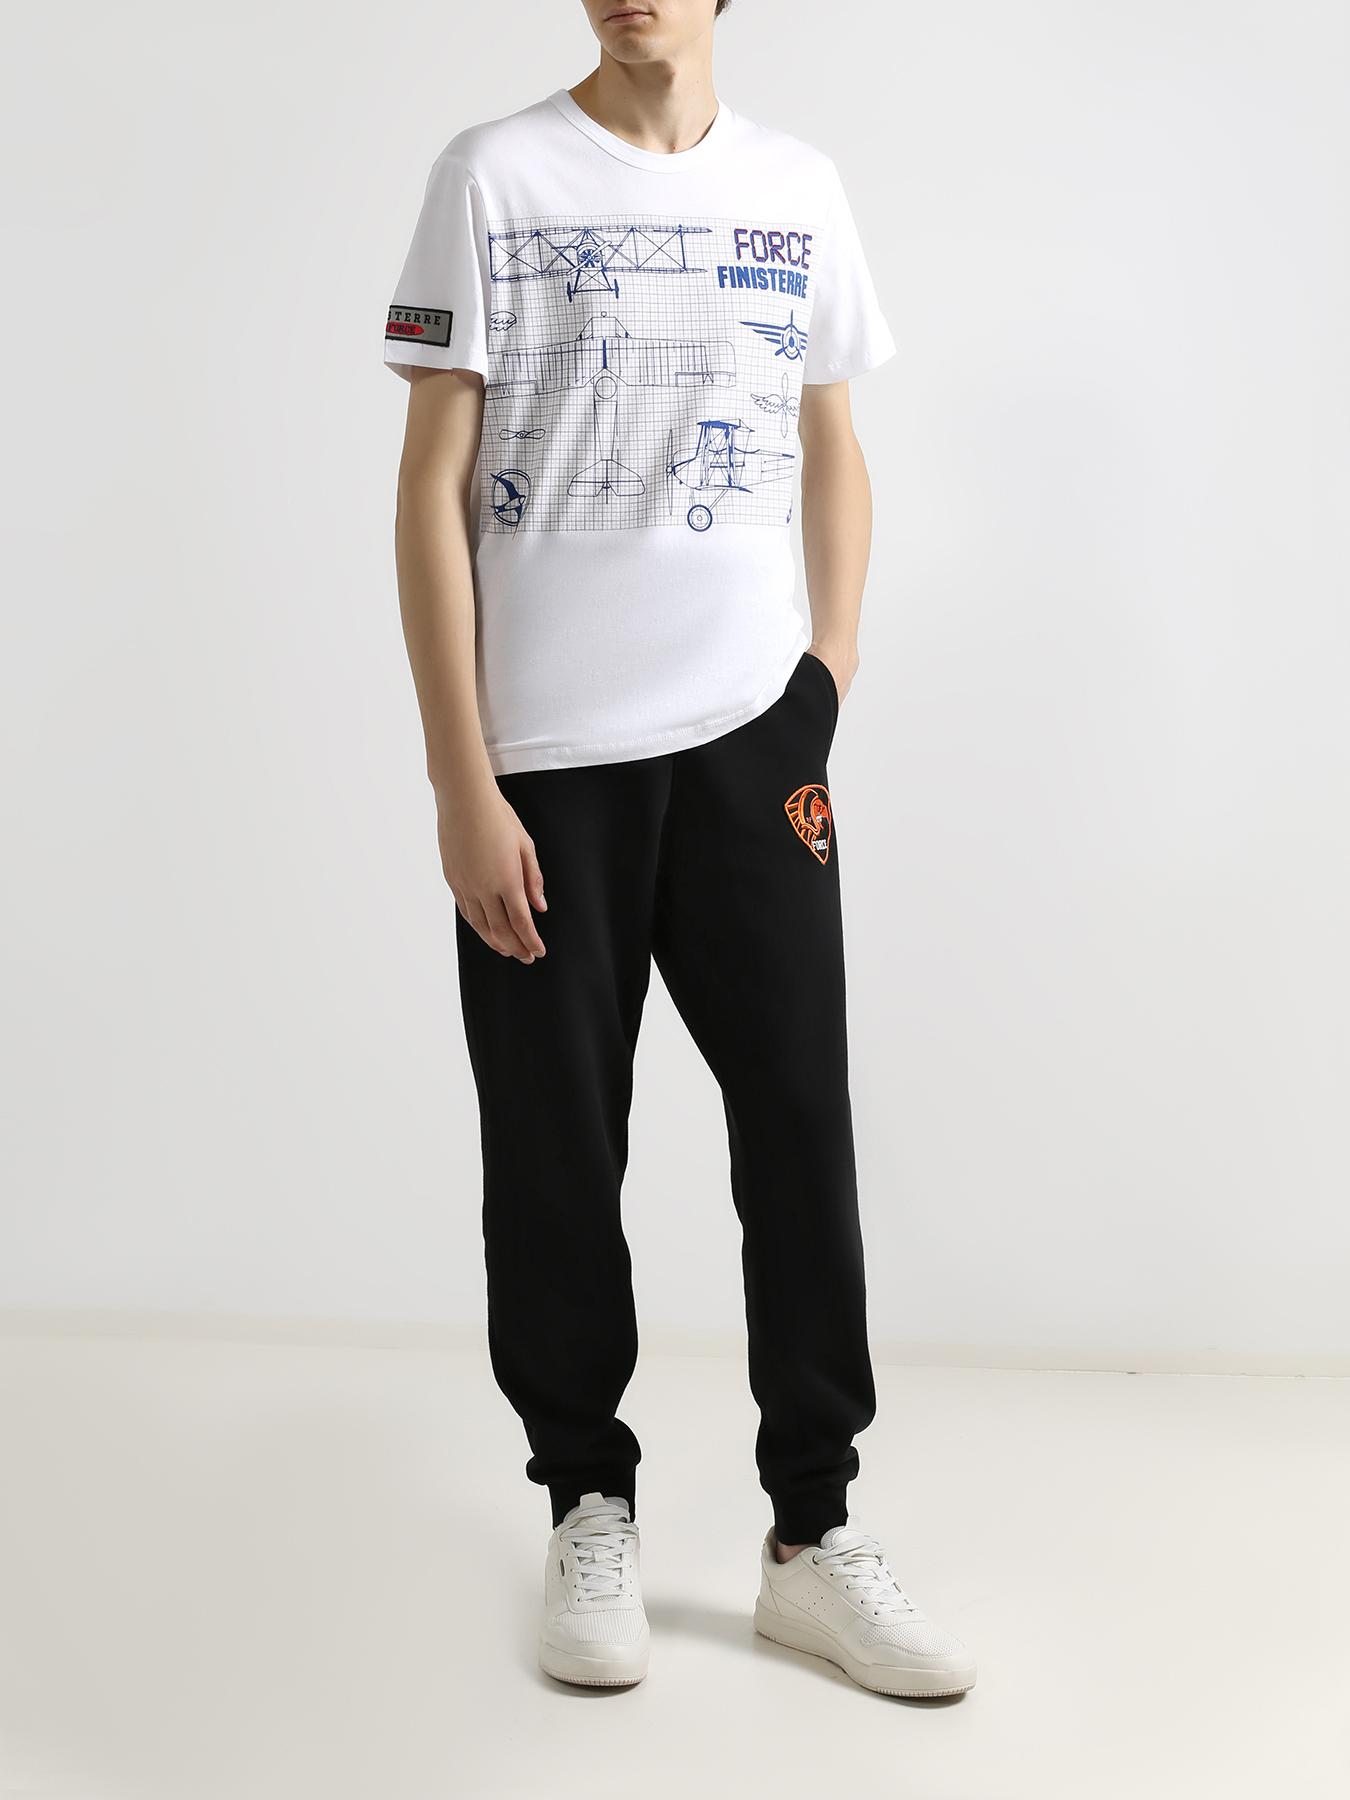 Брюки Finisterre Force Спортивные брюки